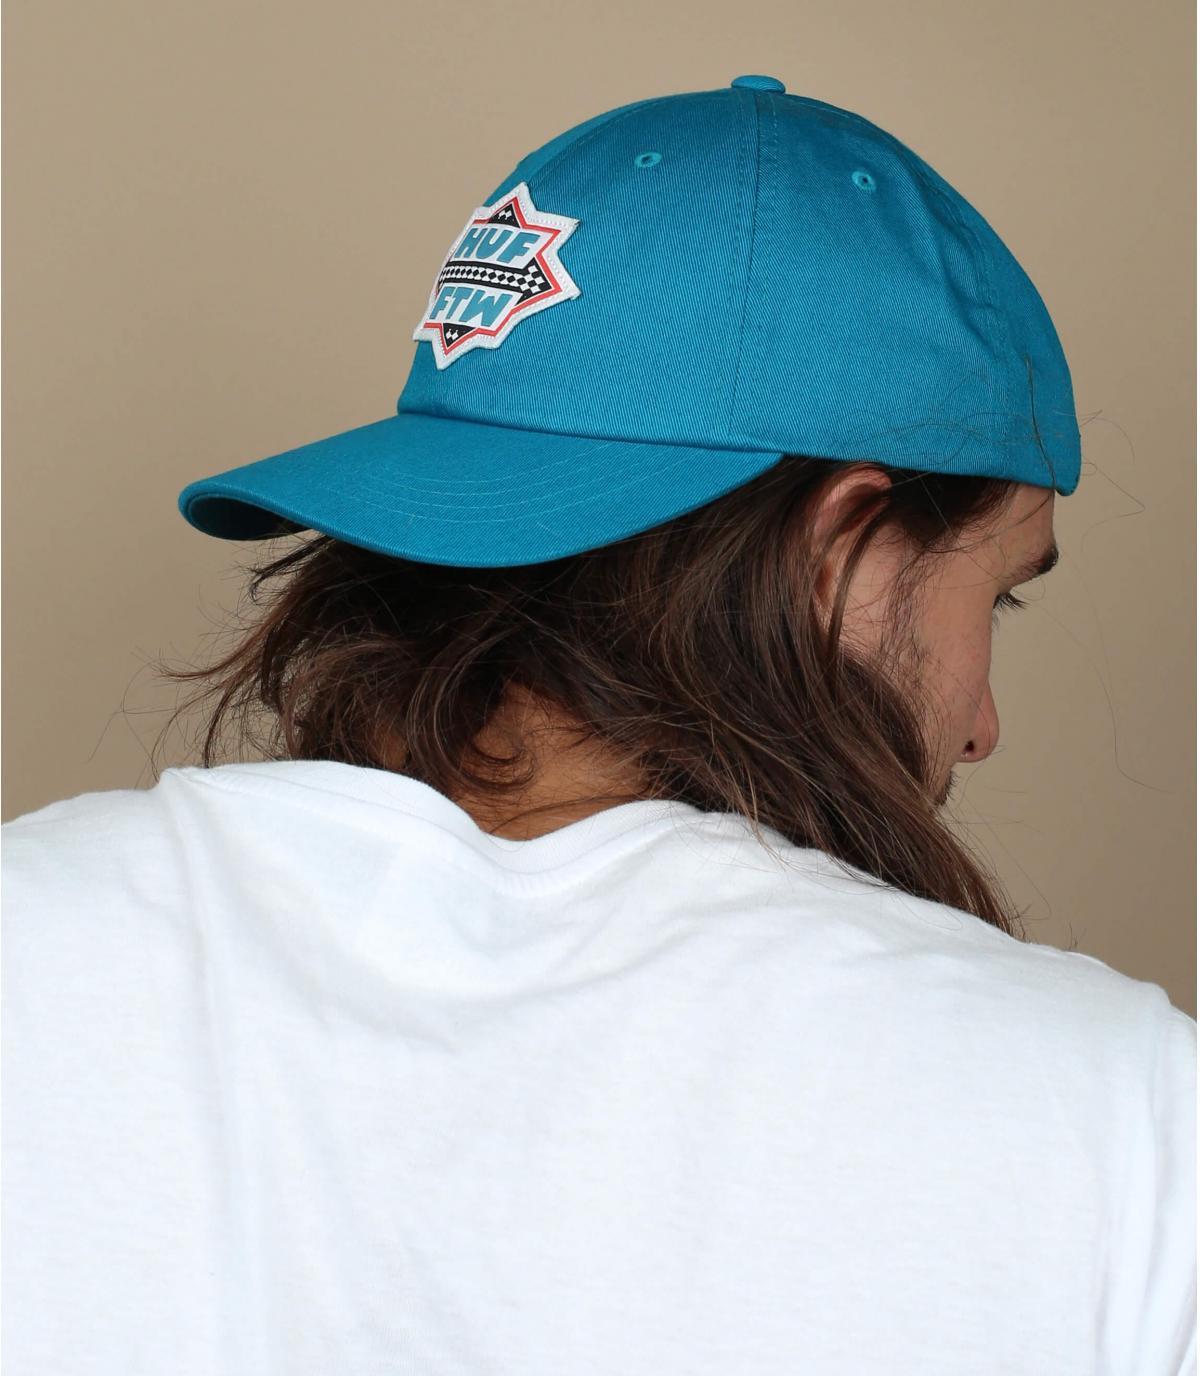 casquette Huf bleu